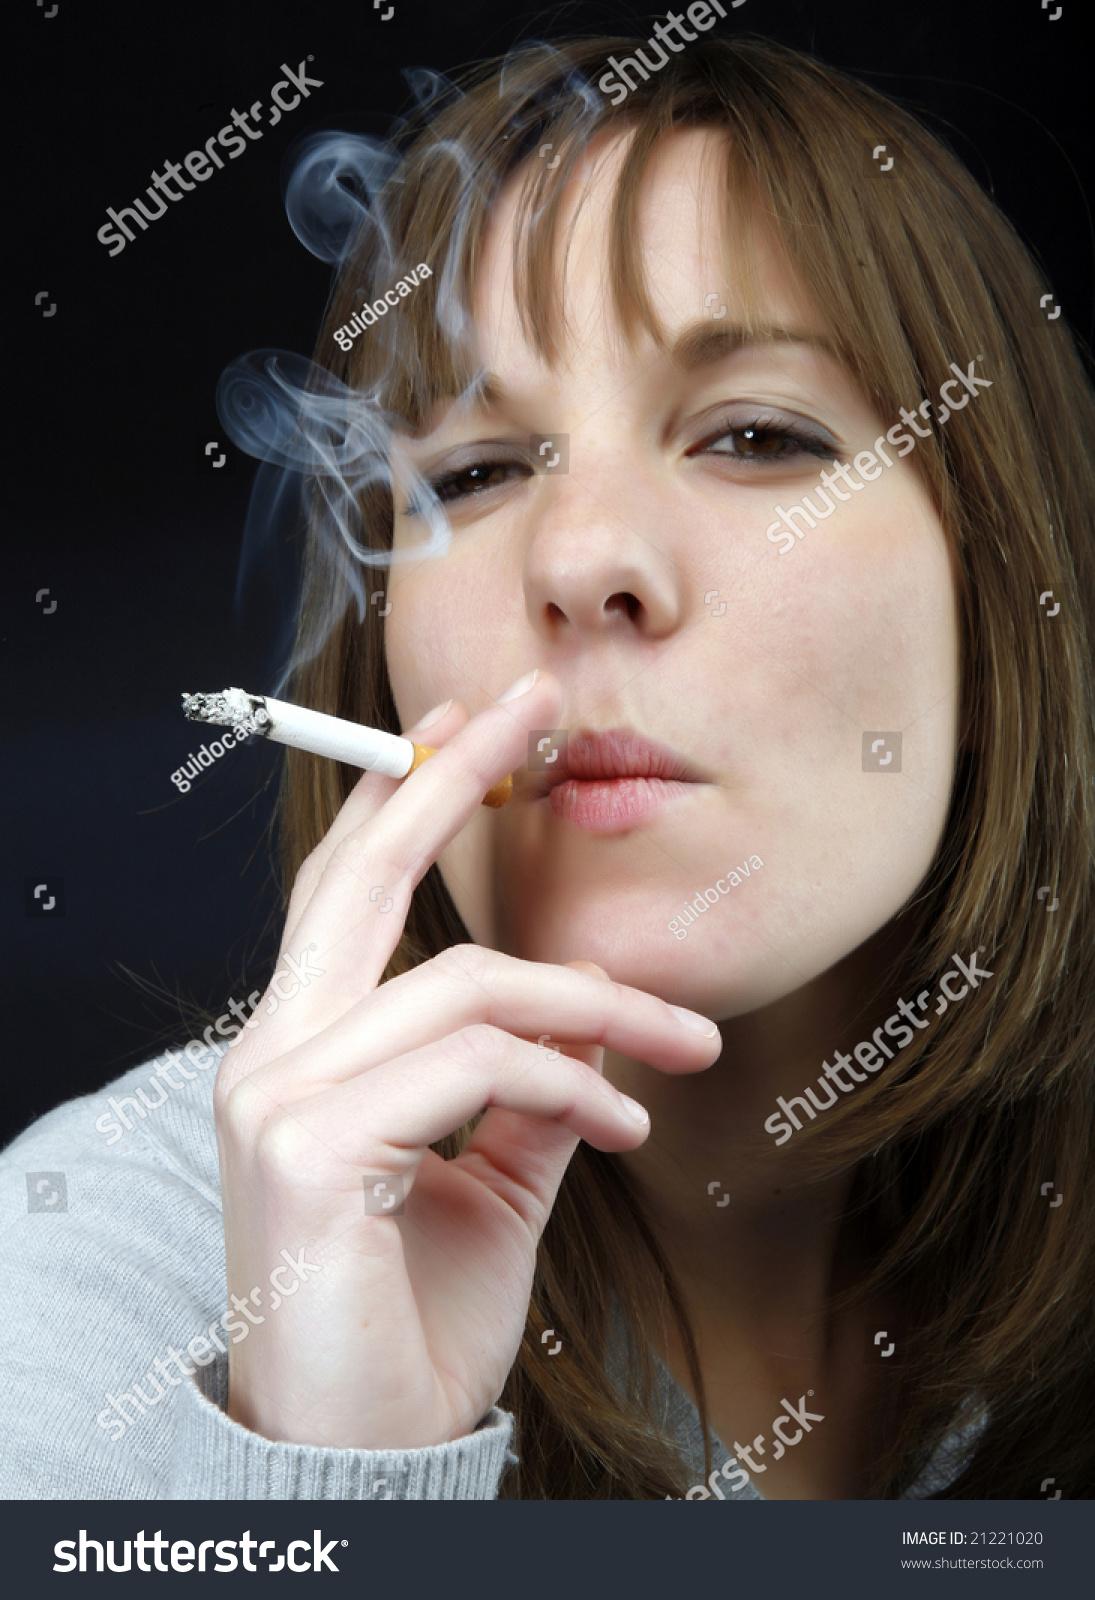 Young Beautiful Girl Smoking Cigarette Stock Photo ...